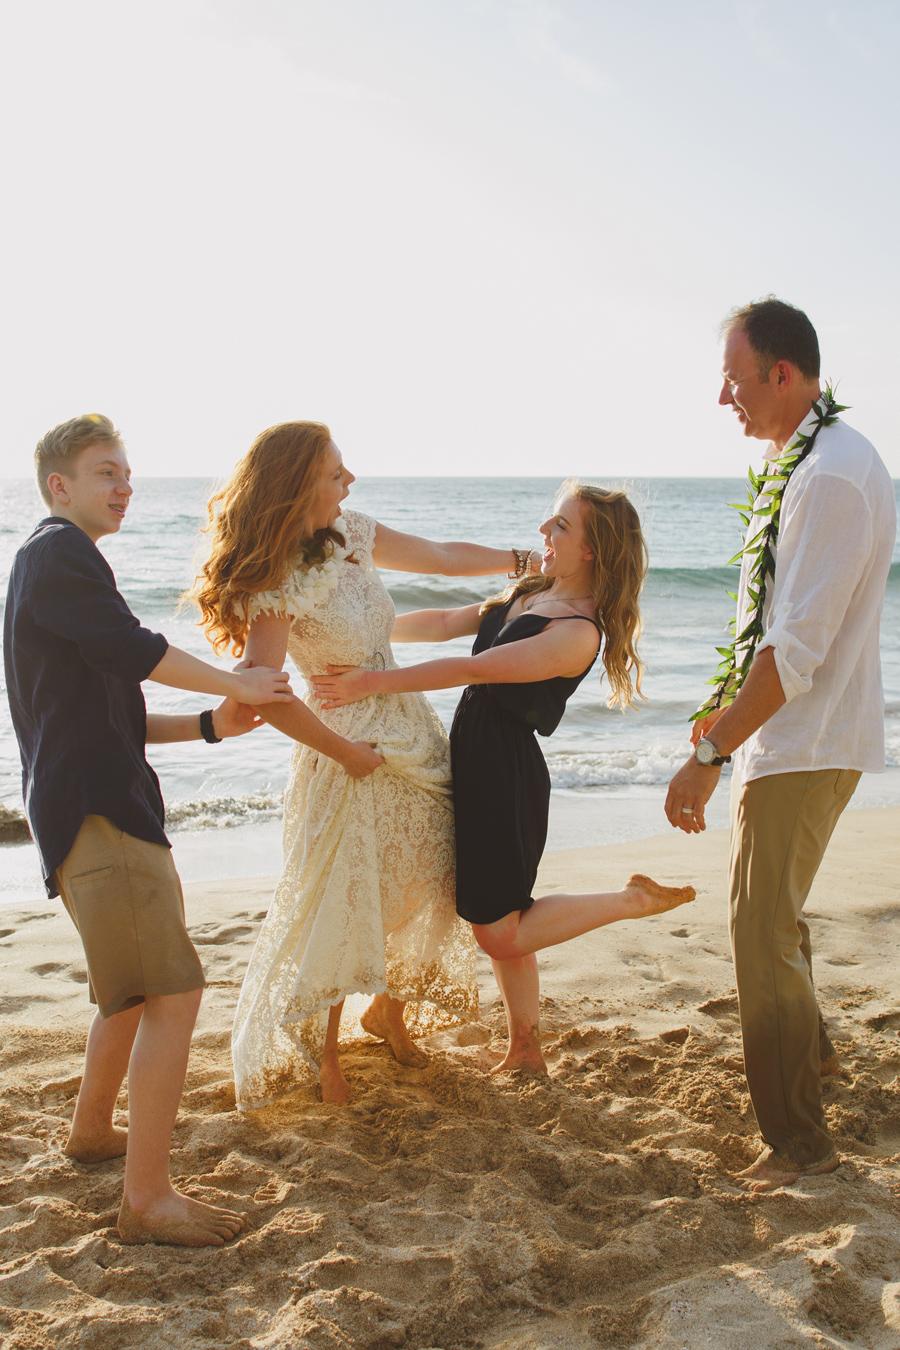 123-family-fun-wedding-photography-maui.jpg